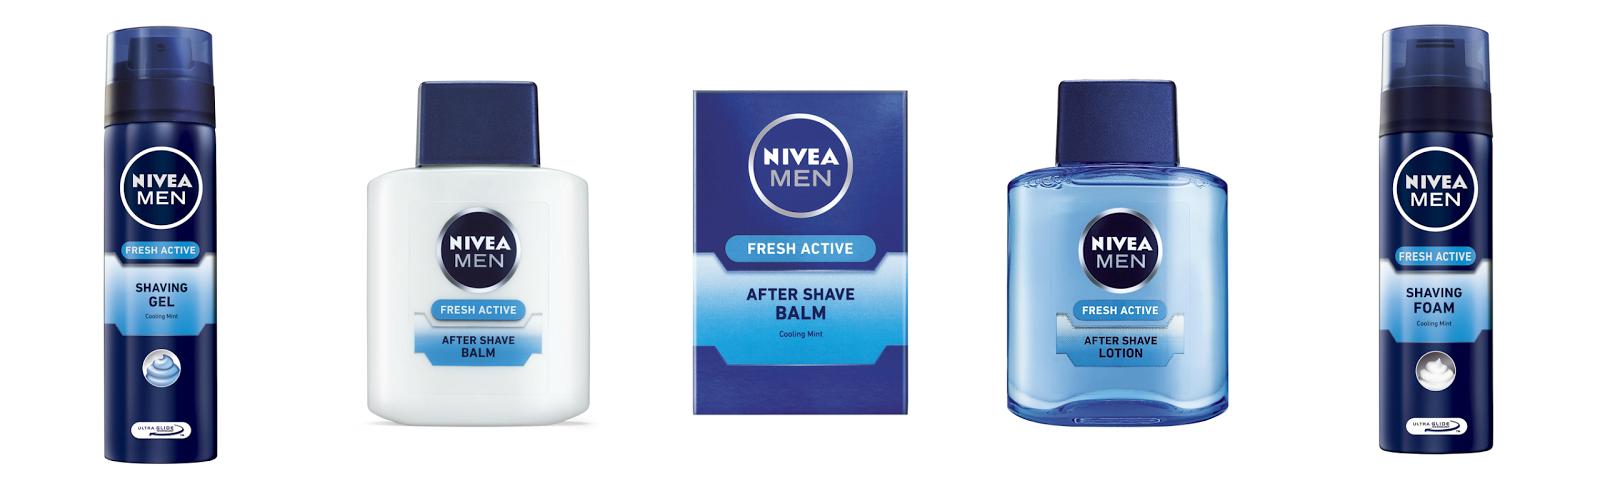 PR:Nivea Men Fresh Active Shaving Range